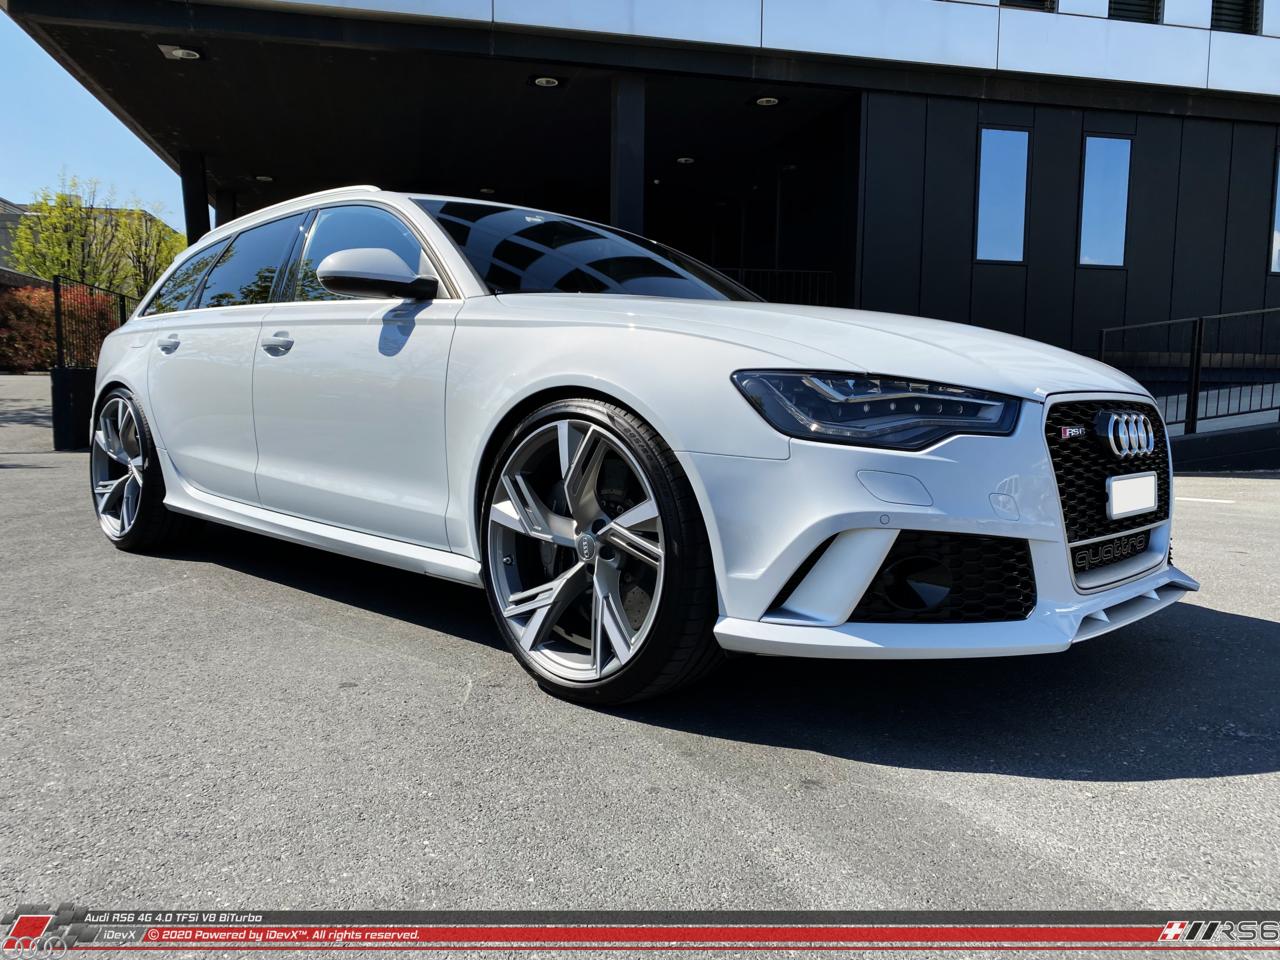 24.04.2020_Audi-RS6_iDevX_005.png